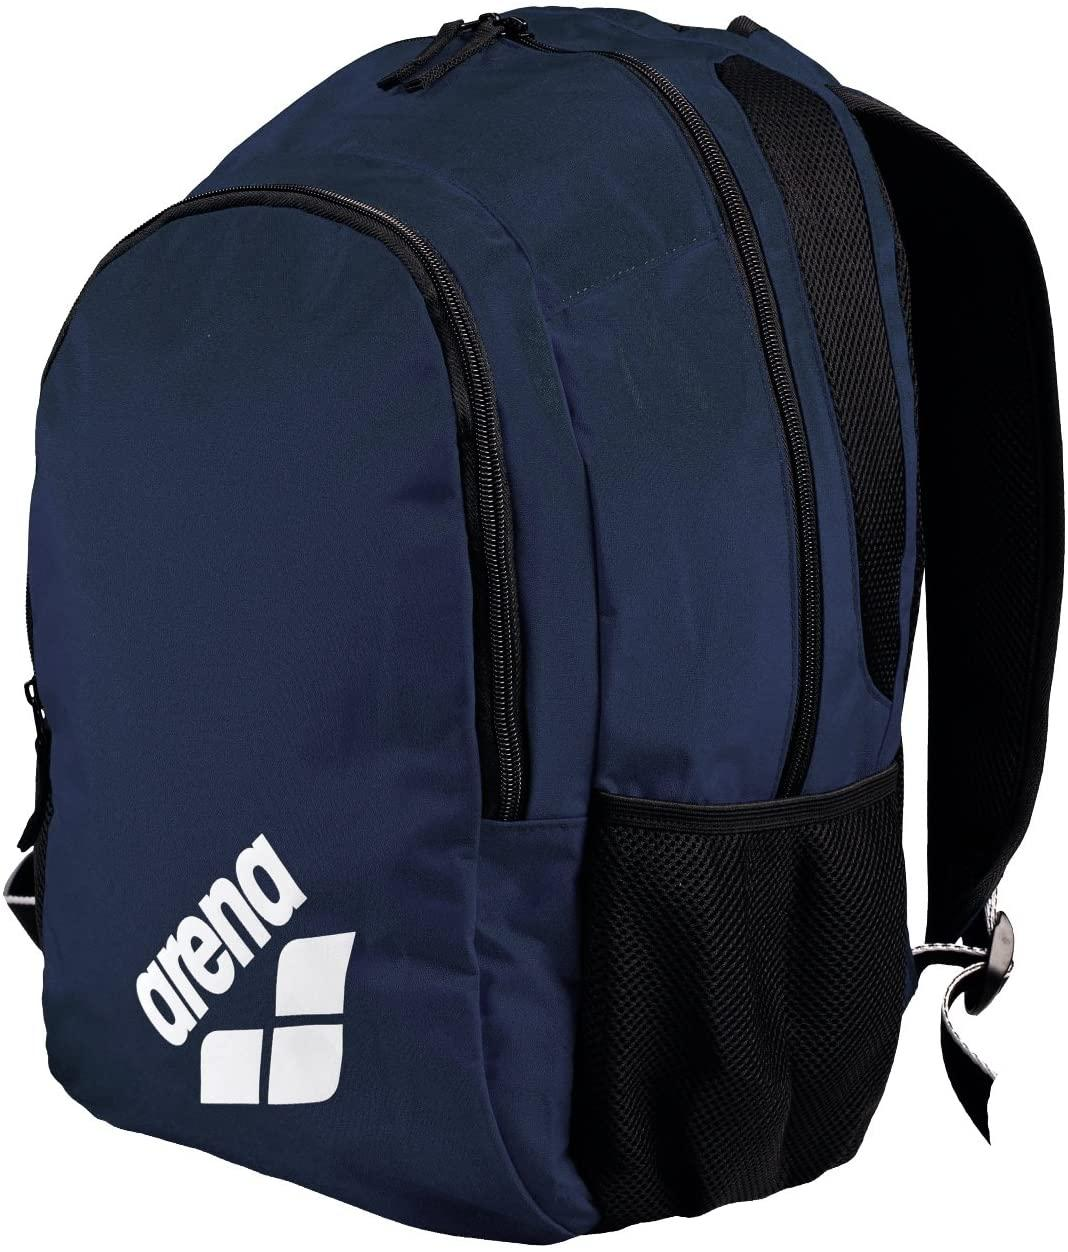 Рюкзак 30 літрів Arena Spiky 2 Backpack Navy Team (1E00576)